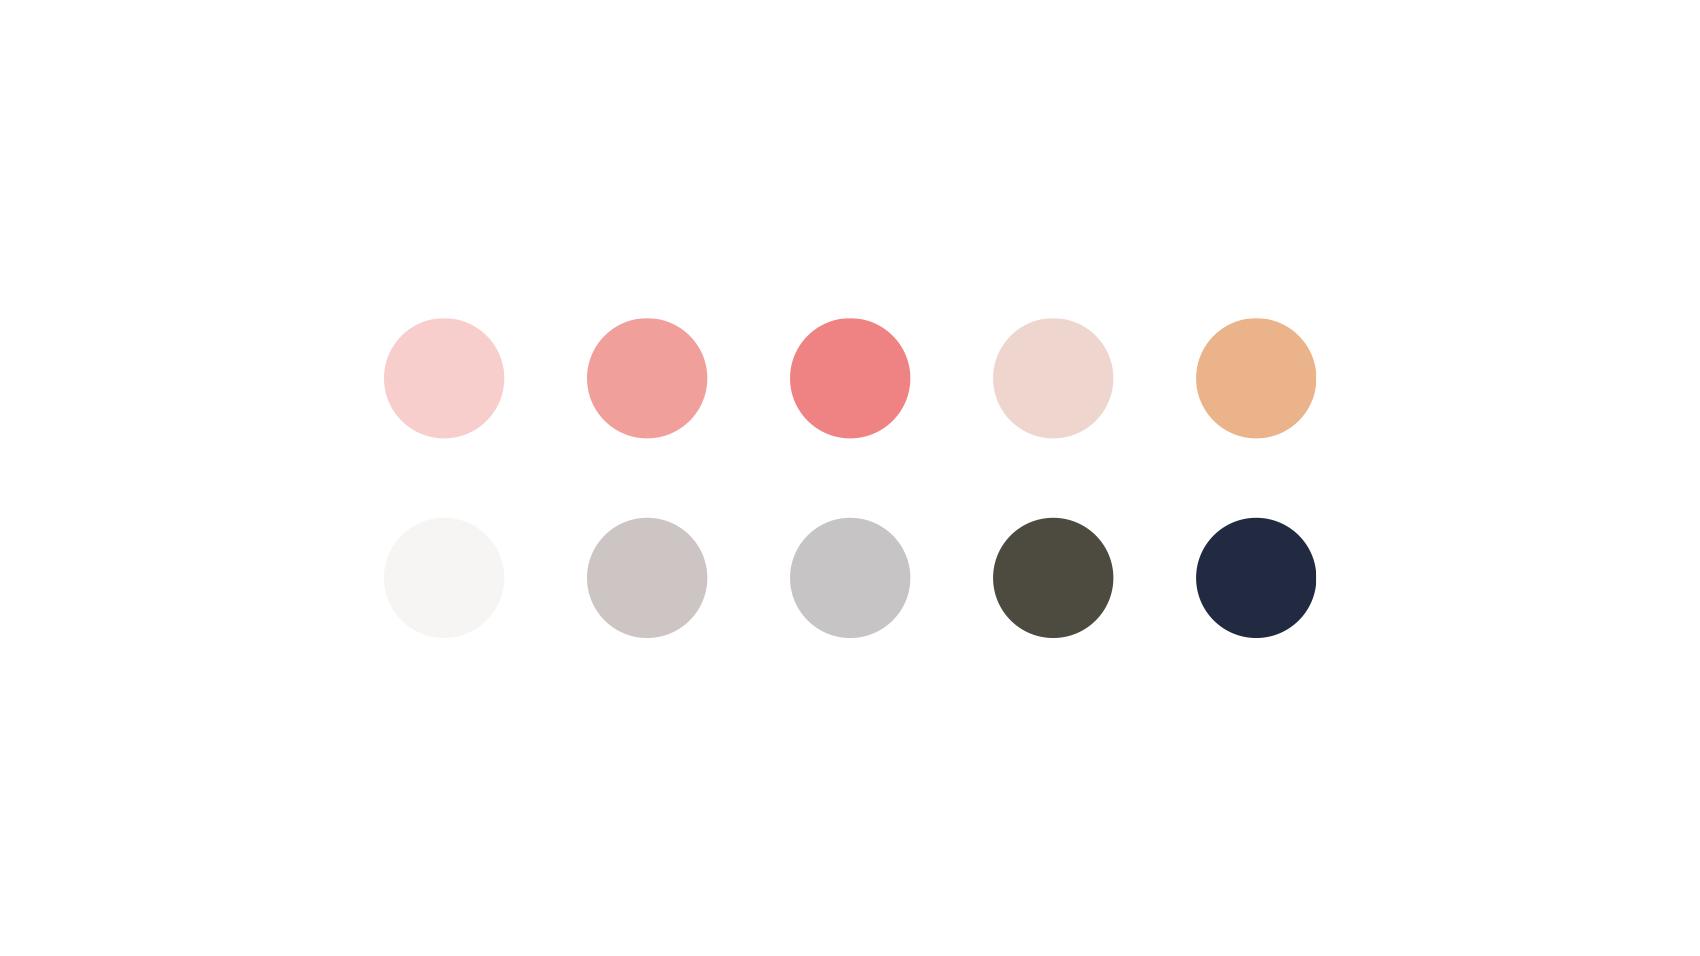 annaの使用カラー一覧